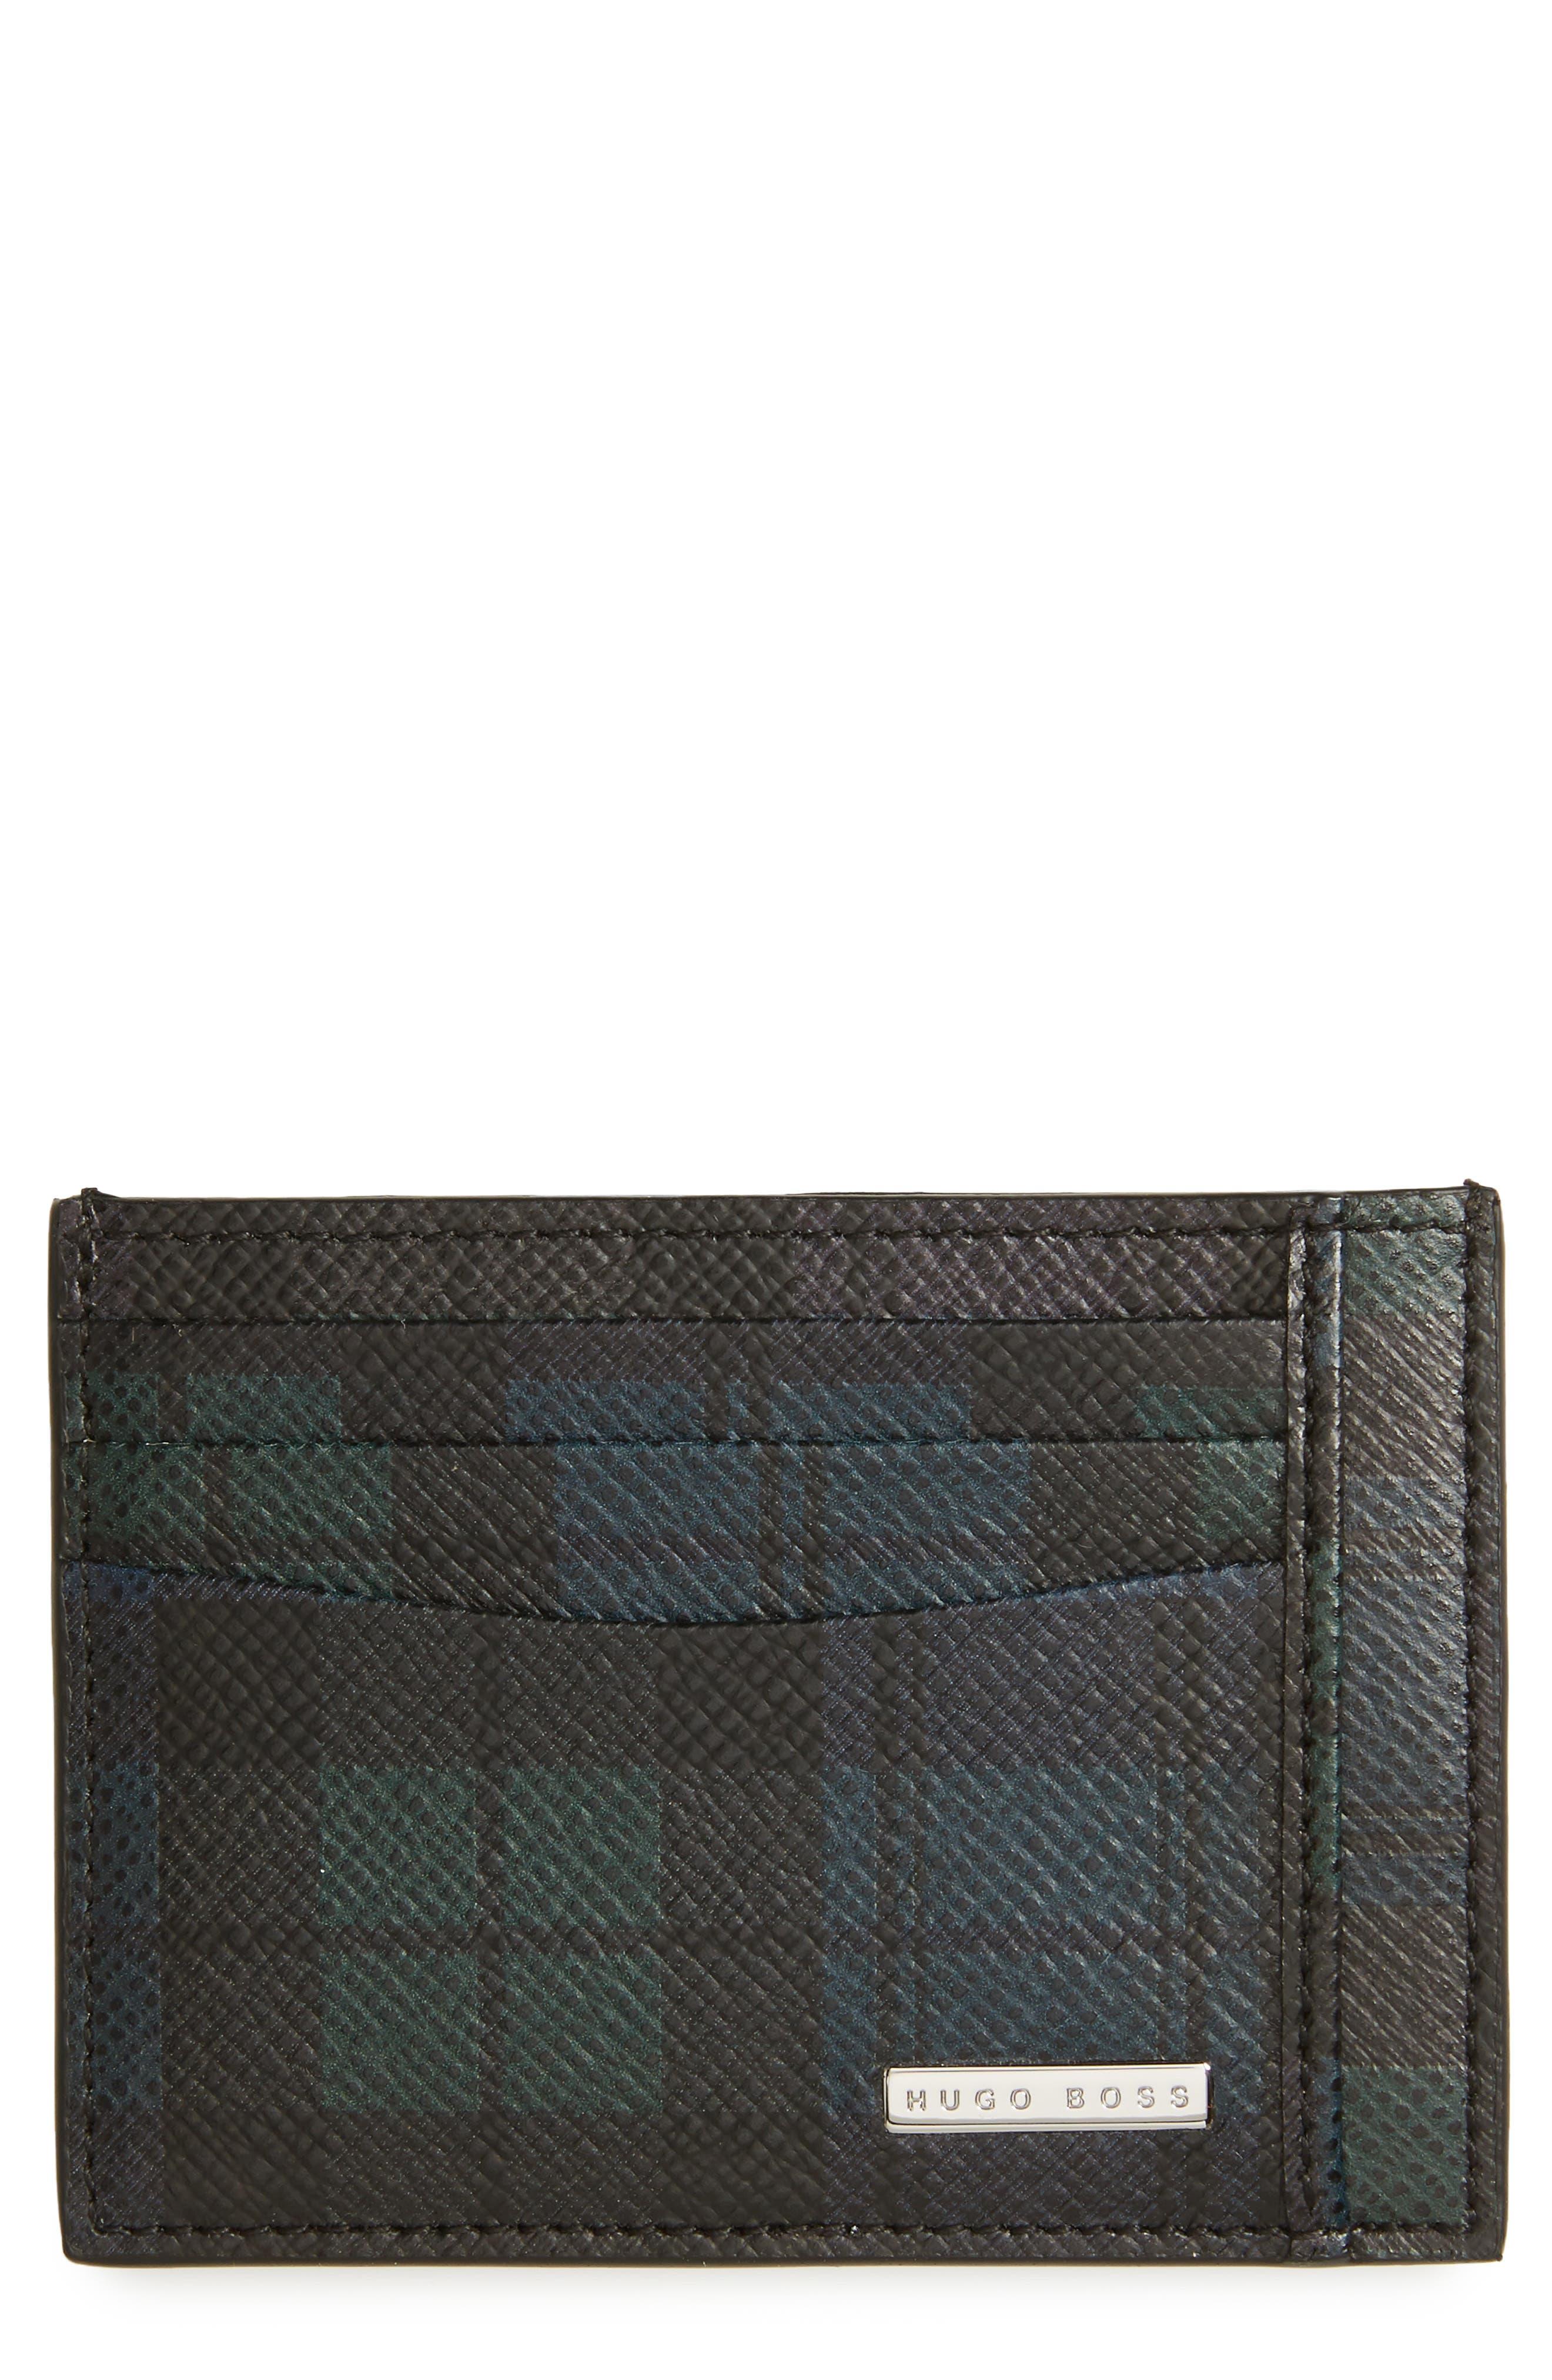 Main Image - BOSS Signature Leather Card Case